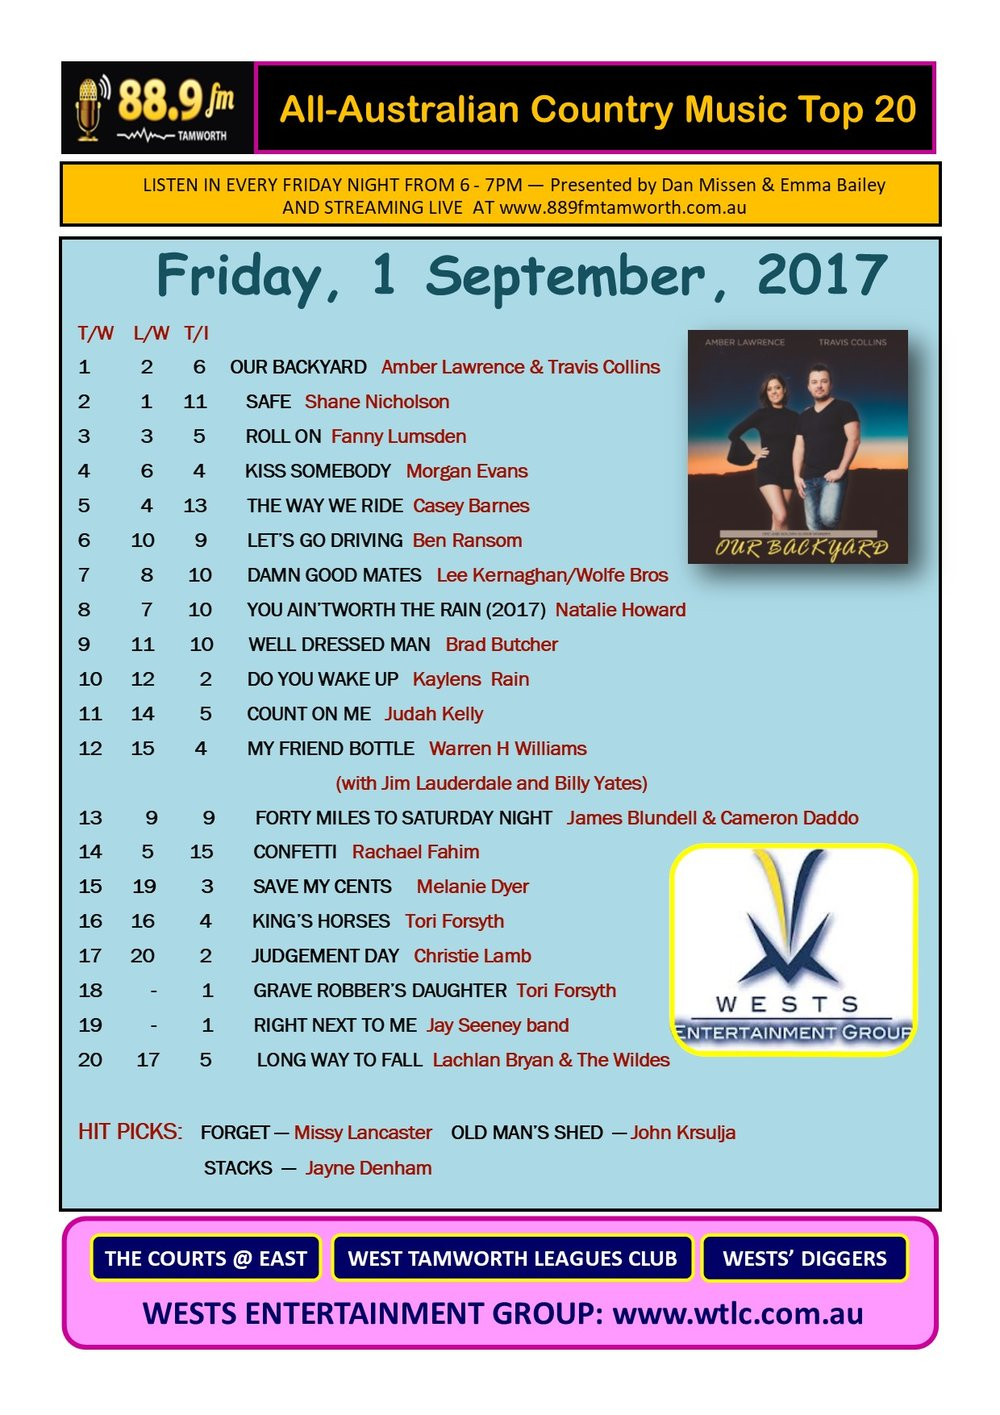 Top 20 Australian Country Music Tracks Sept 1